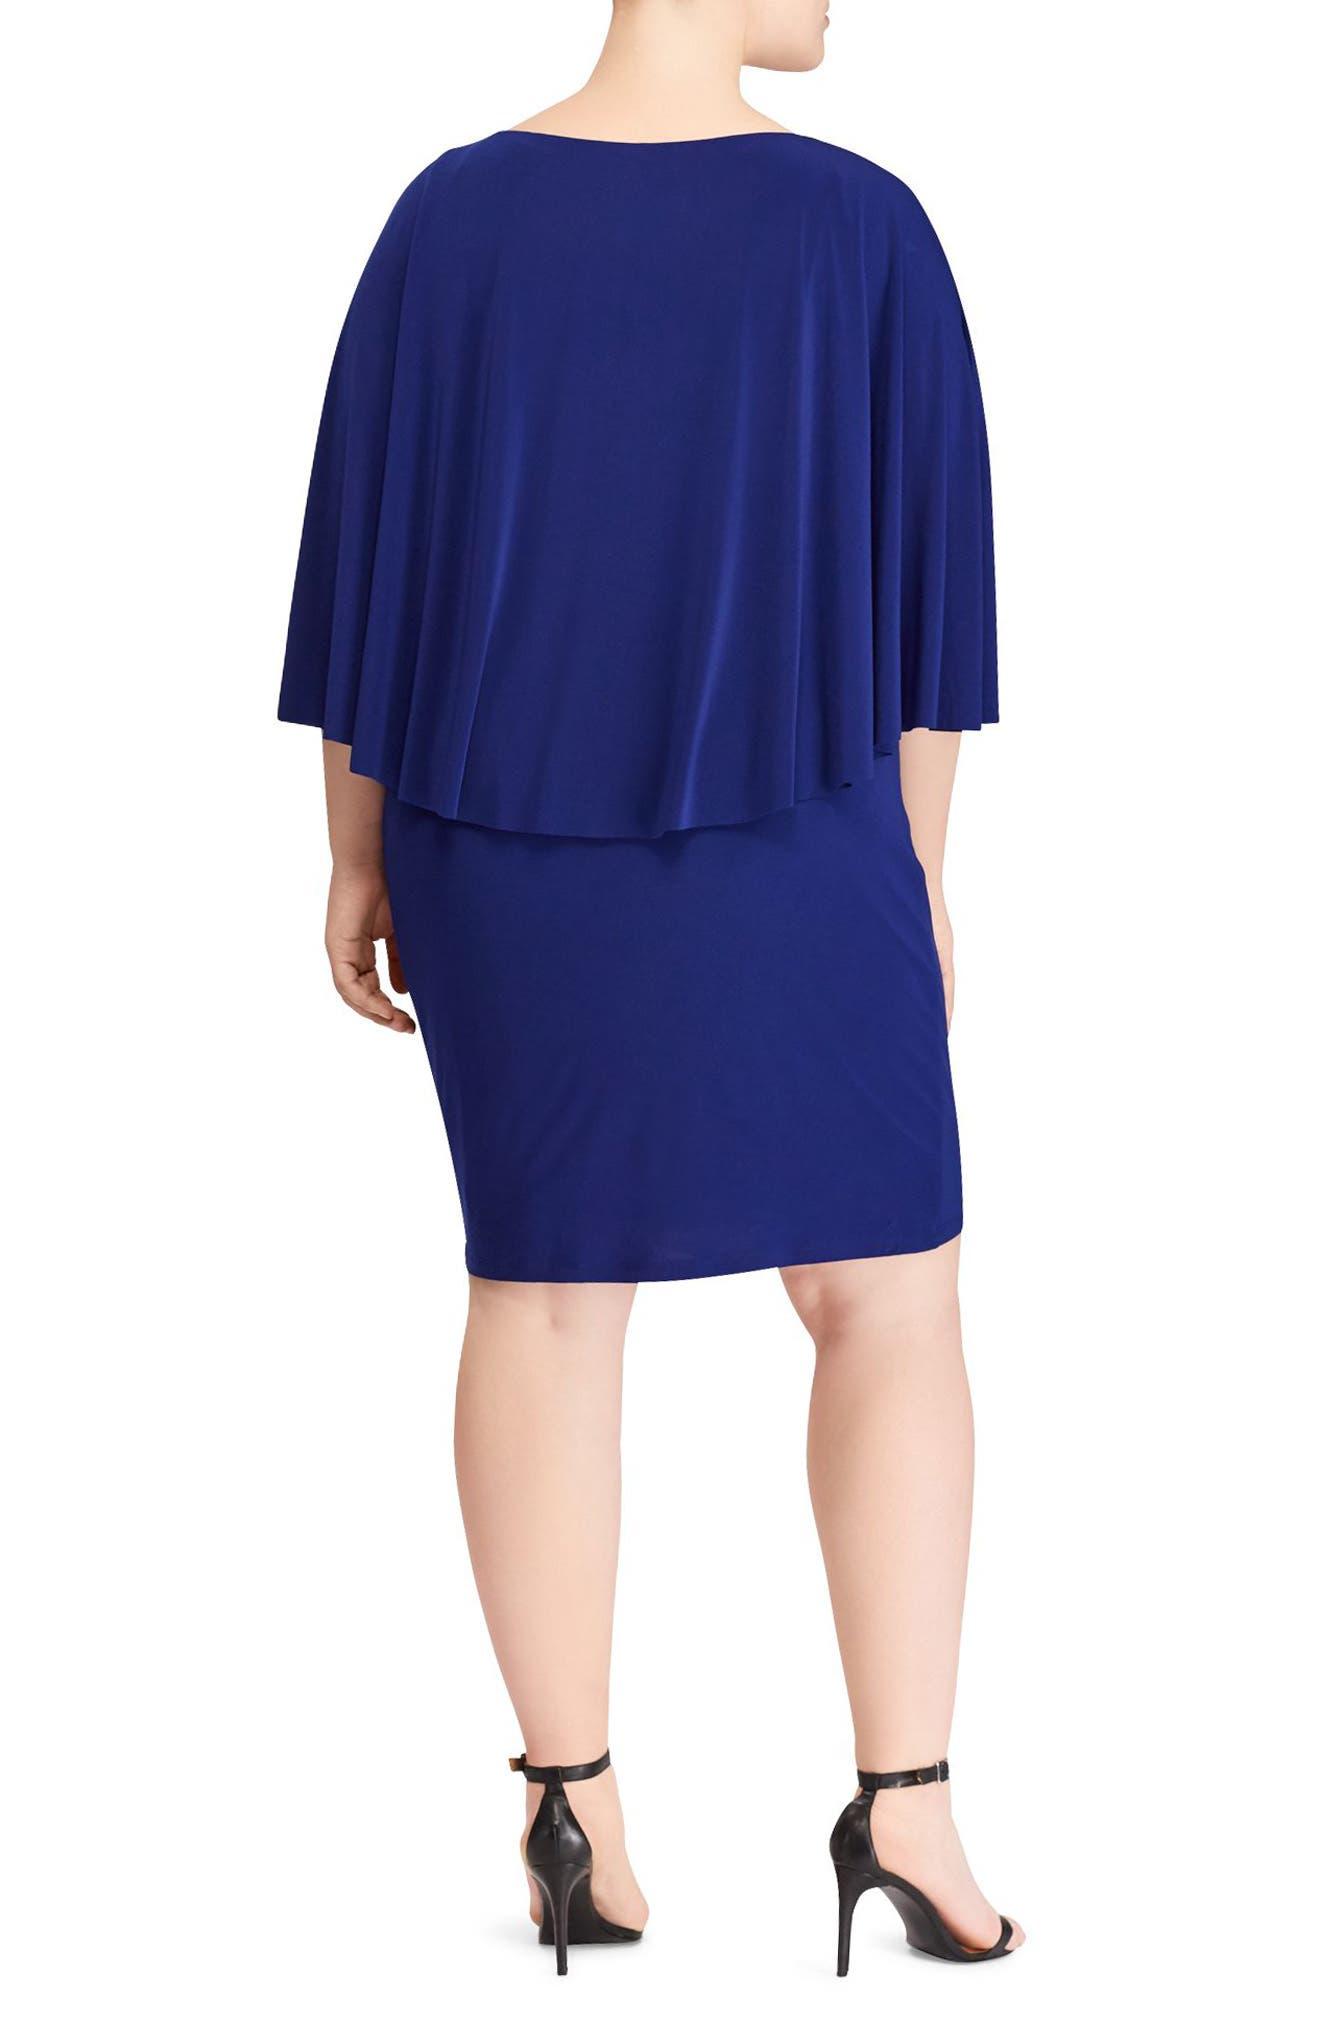 Abriella Cape Sheath Dress,                             Alternate thumbnail 2, color,                             Rich Sapphire